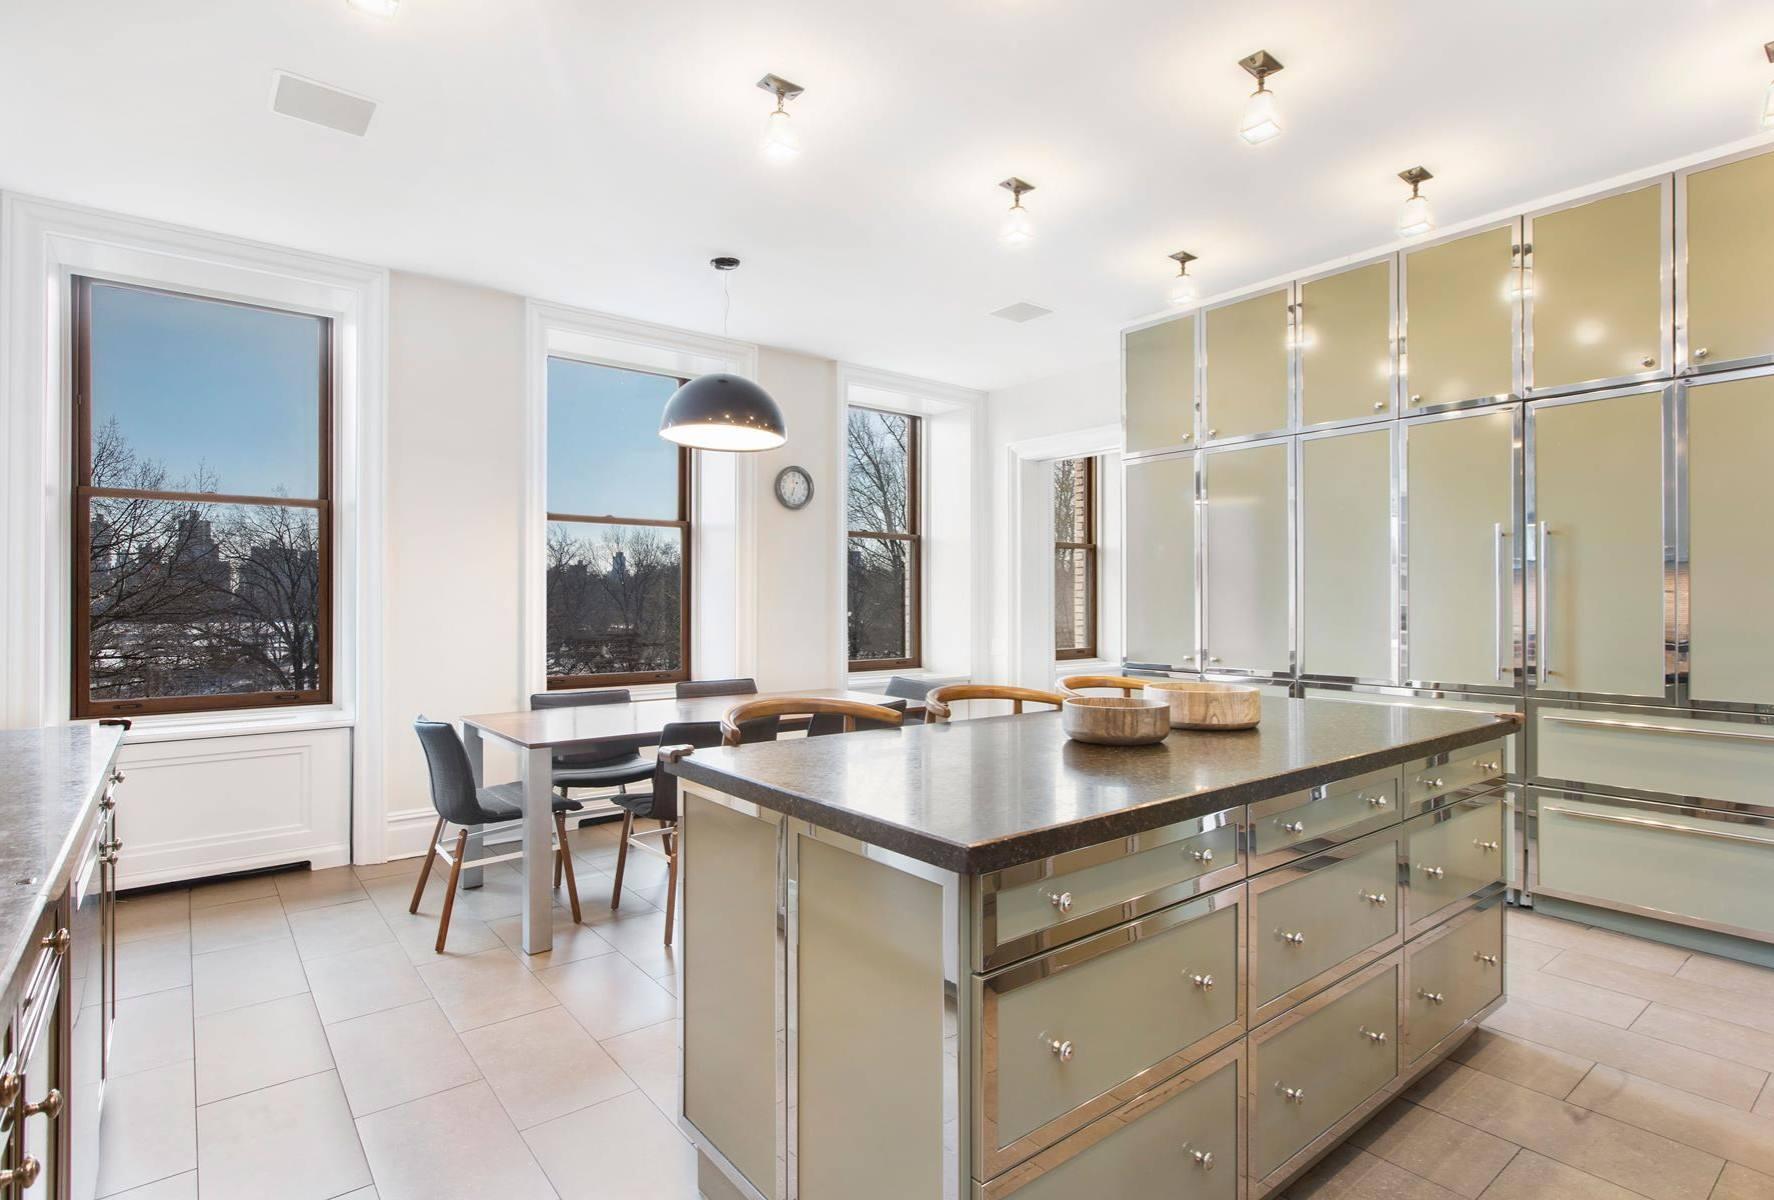 Bruce willis mette in vendita un lussuoso appartamento a for Case in vendita manhattan